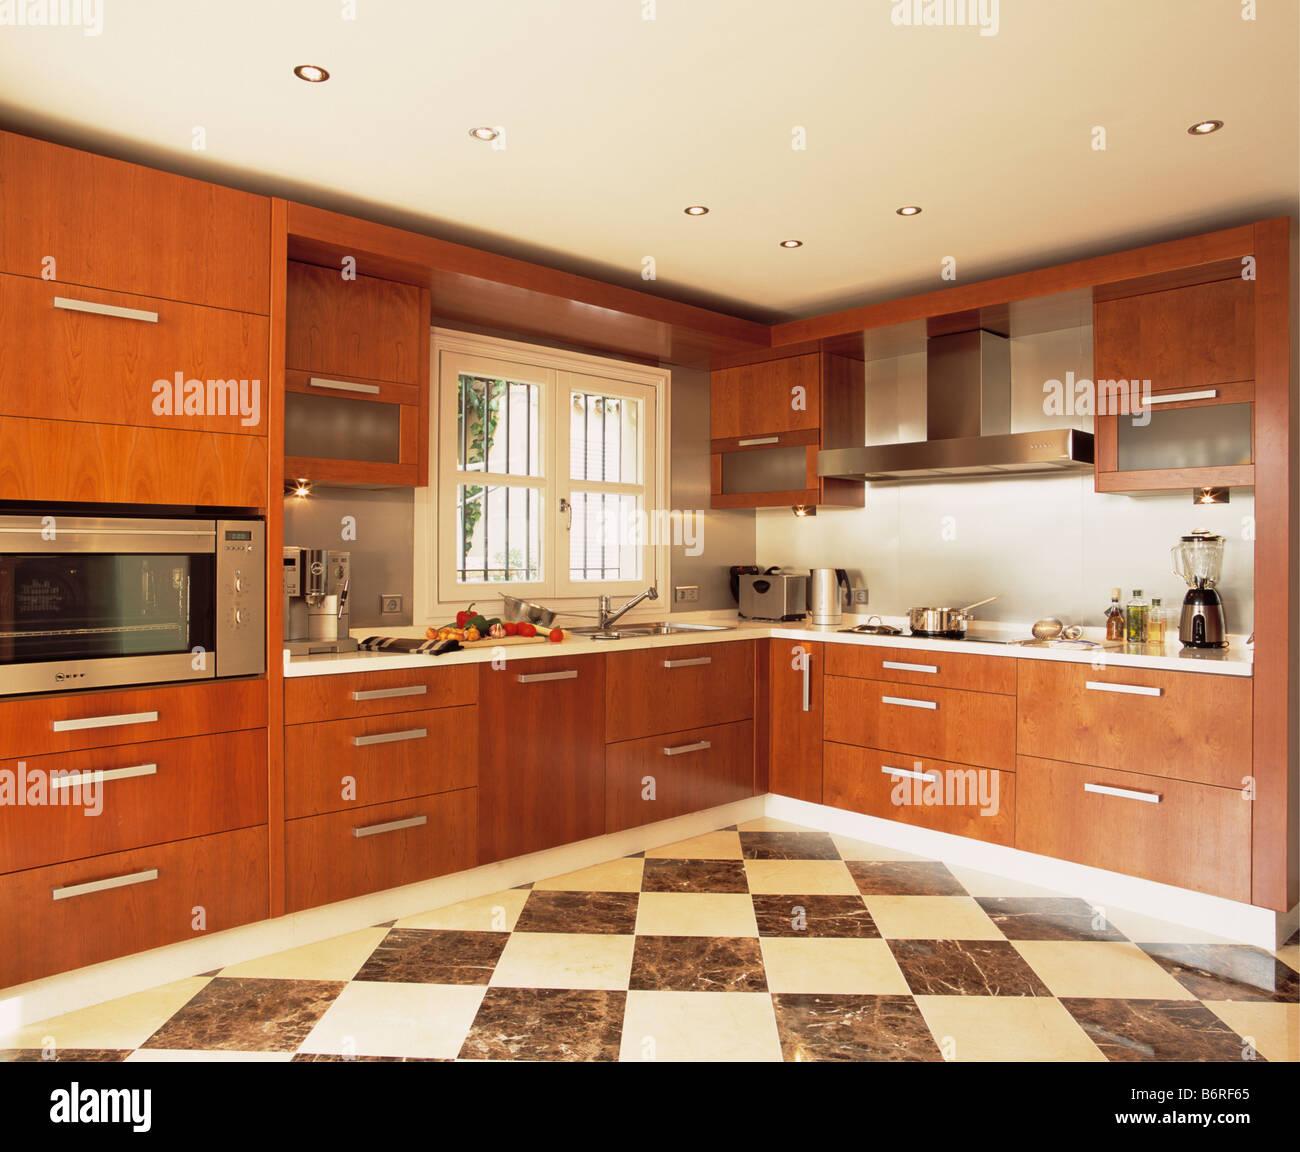 Top Cucine In Ciliegio Moderne Images - Carolineskywalker ...